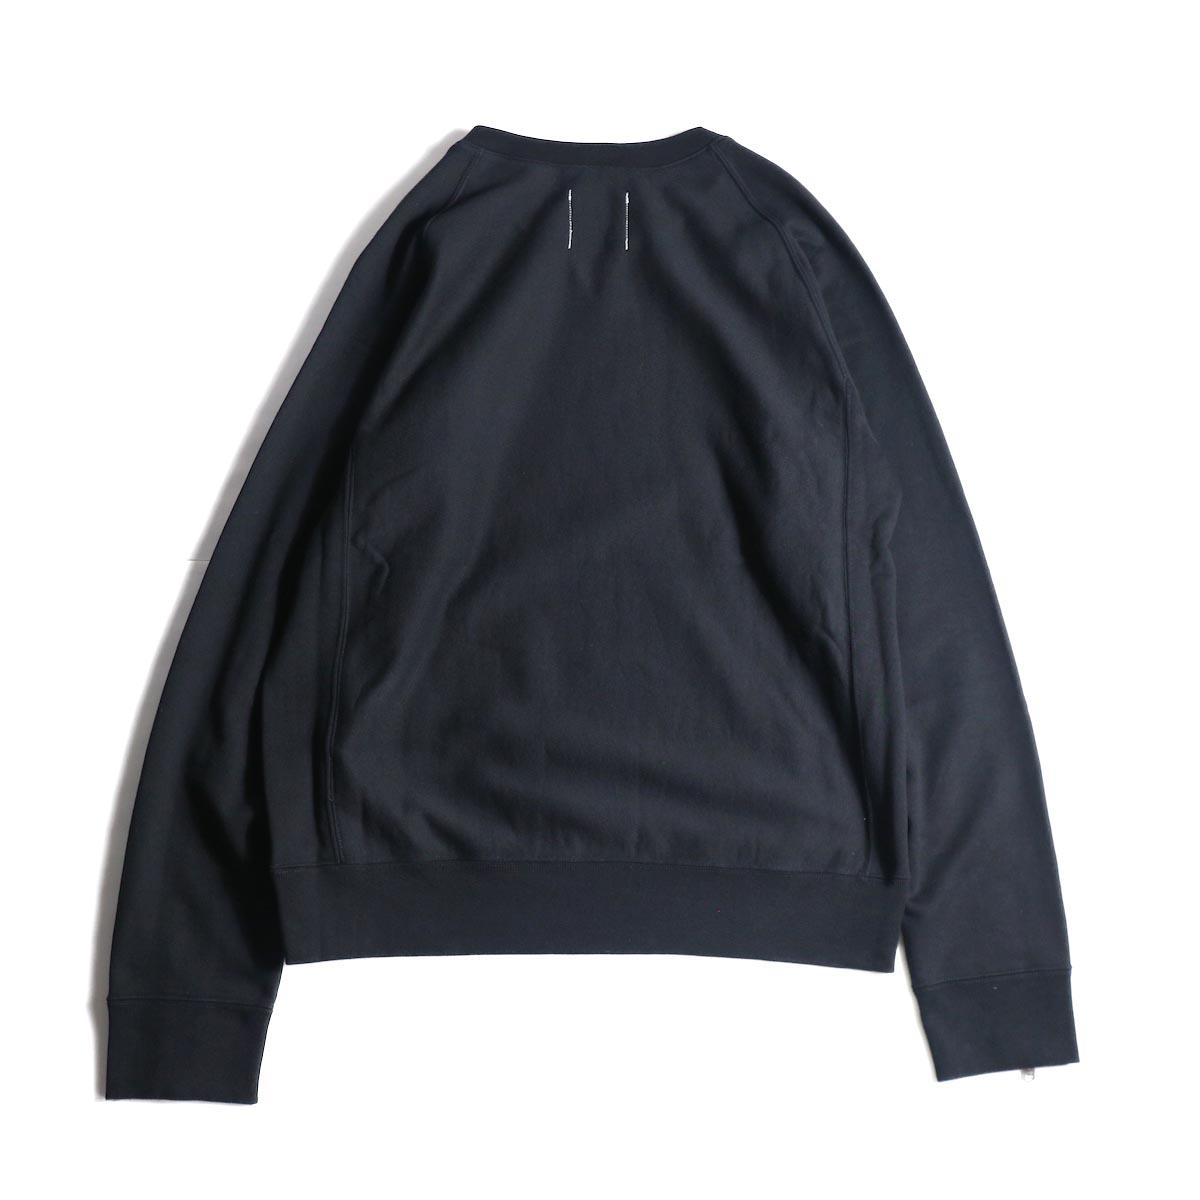 The Soloist / sc.0013bAW20 crew neck sweatshirt. (Black)背面